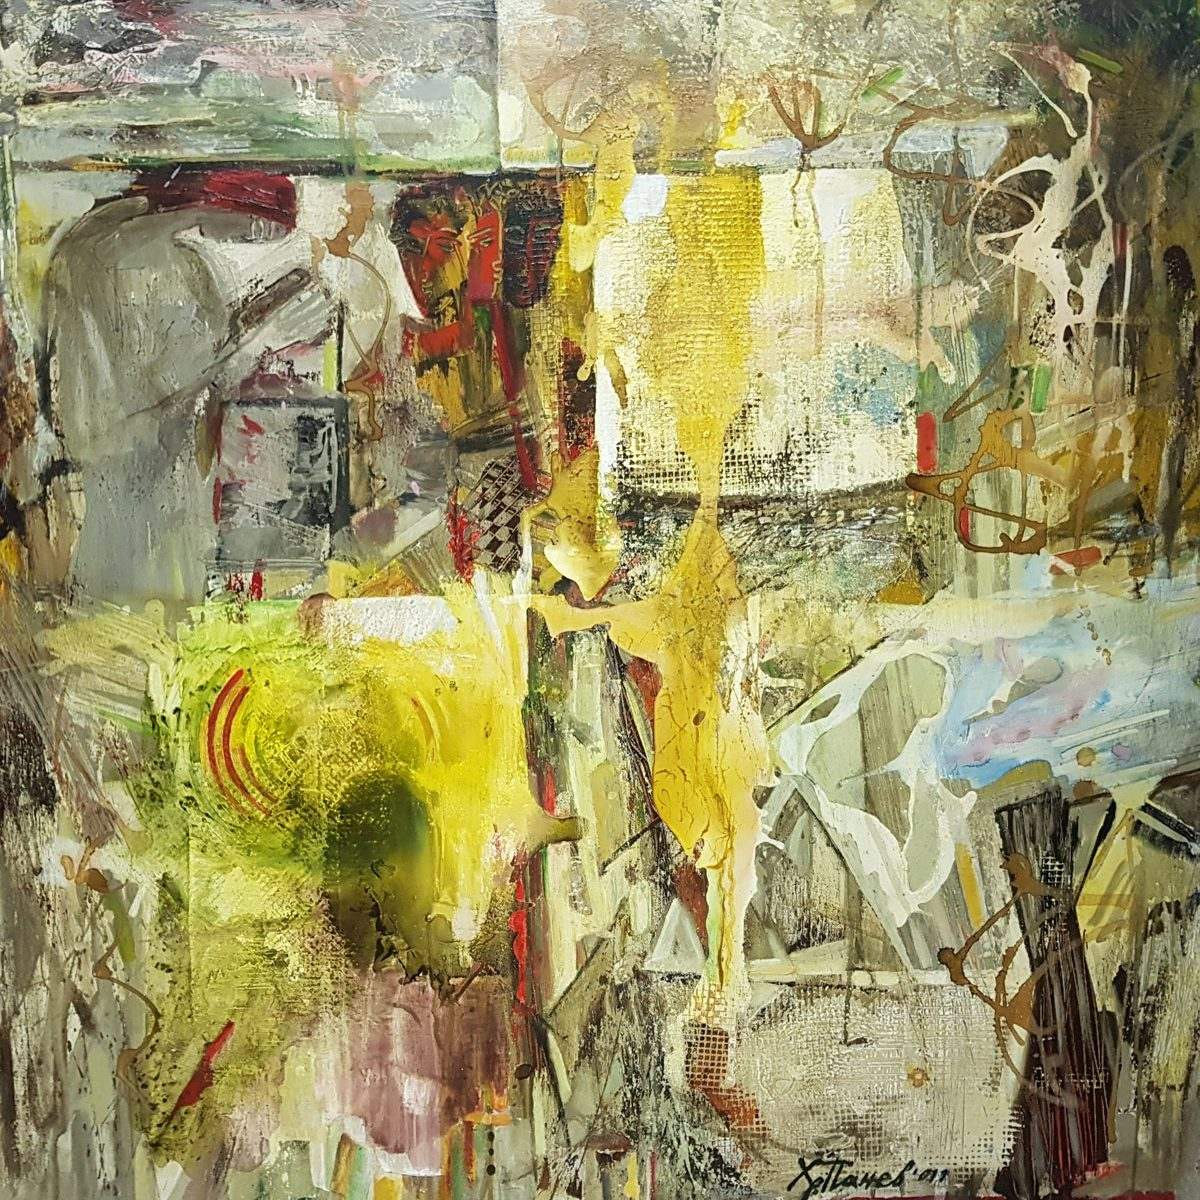 027 Plastove II acryloil on canvas 100x100cm